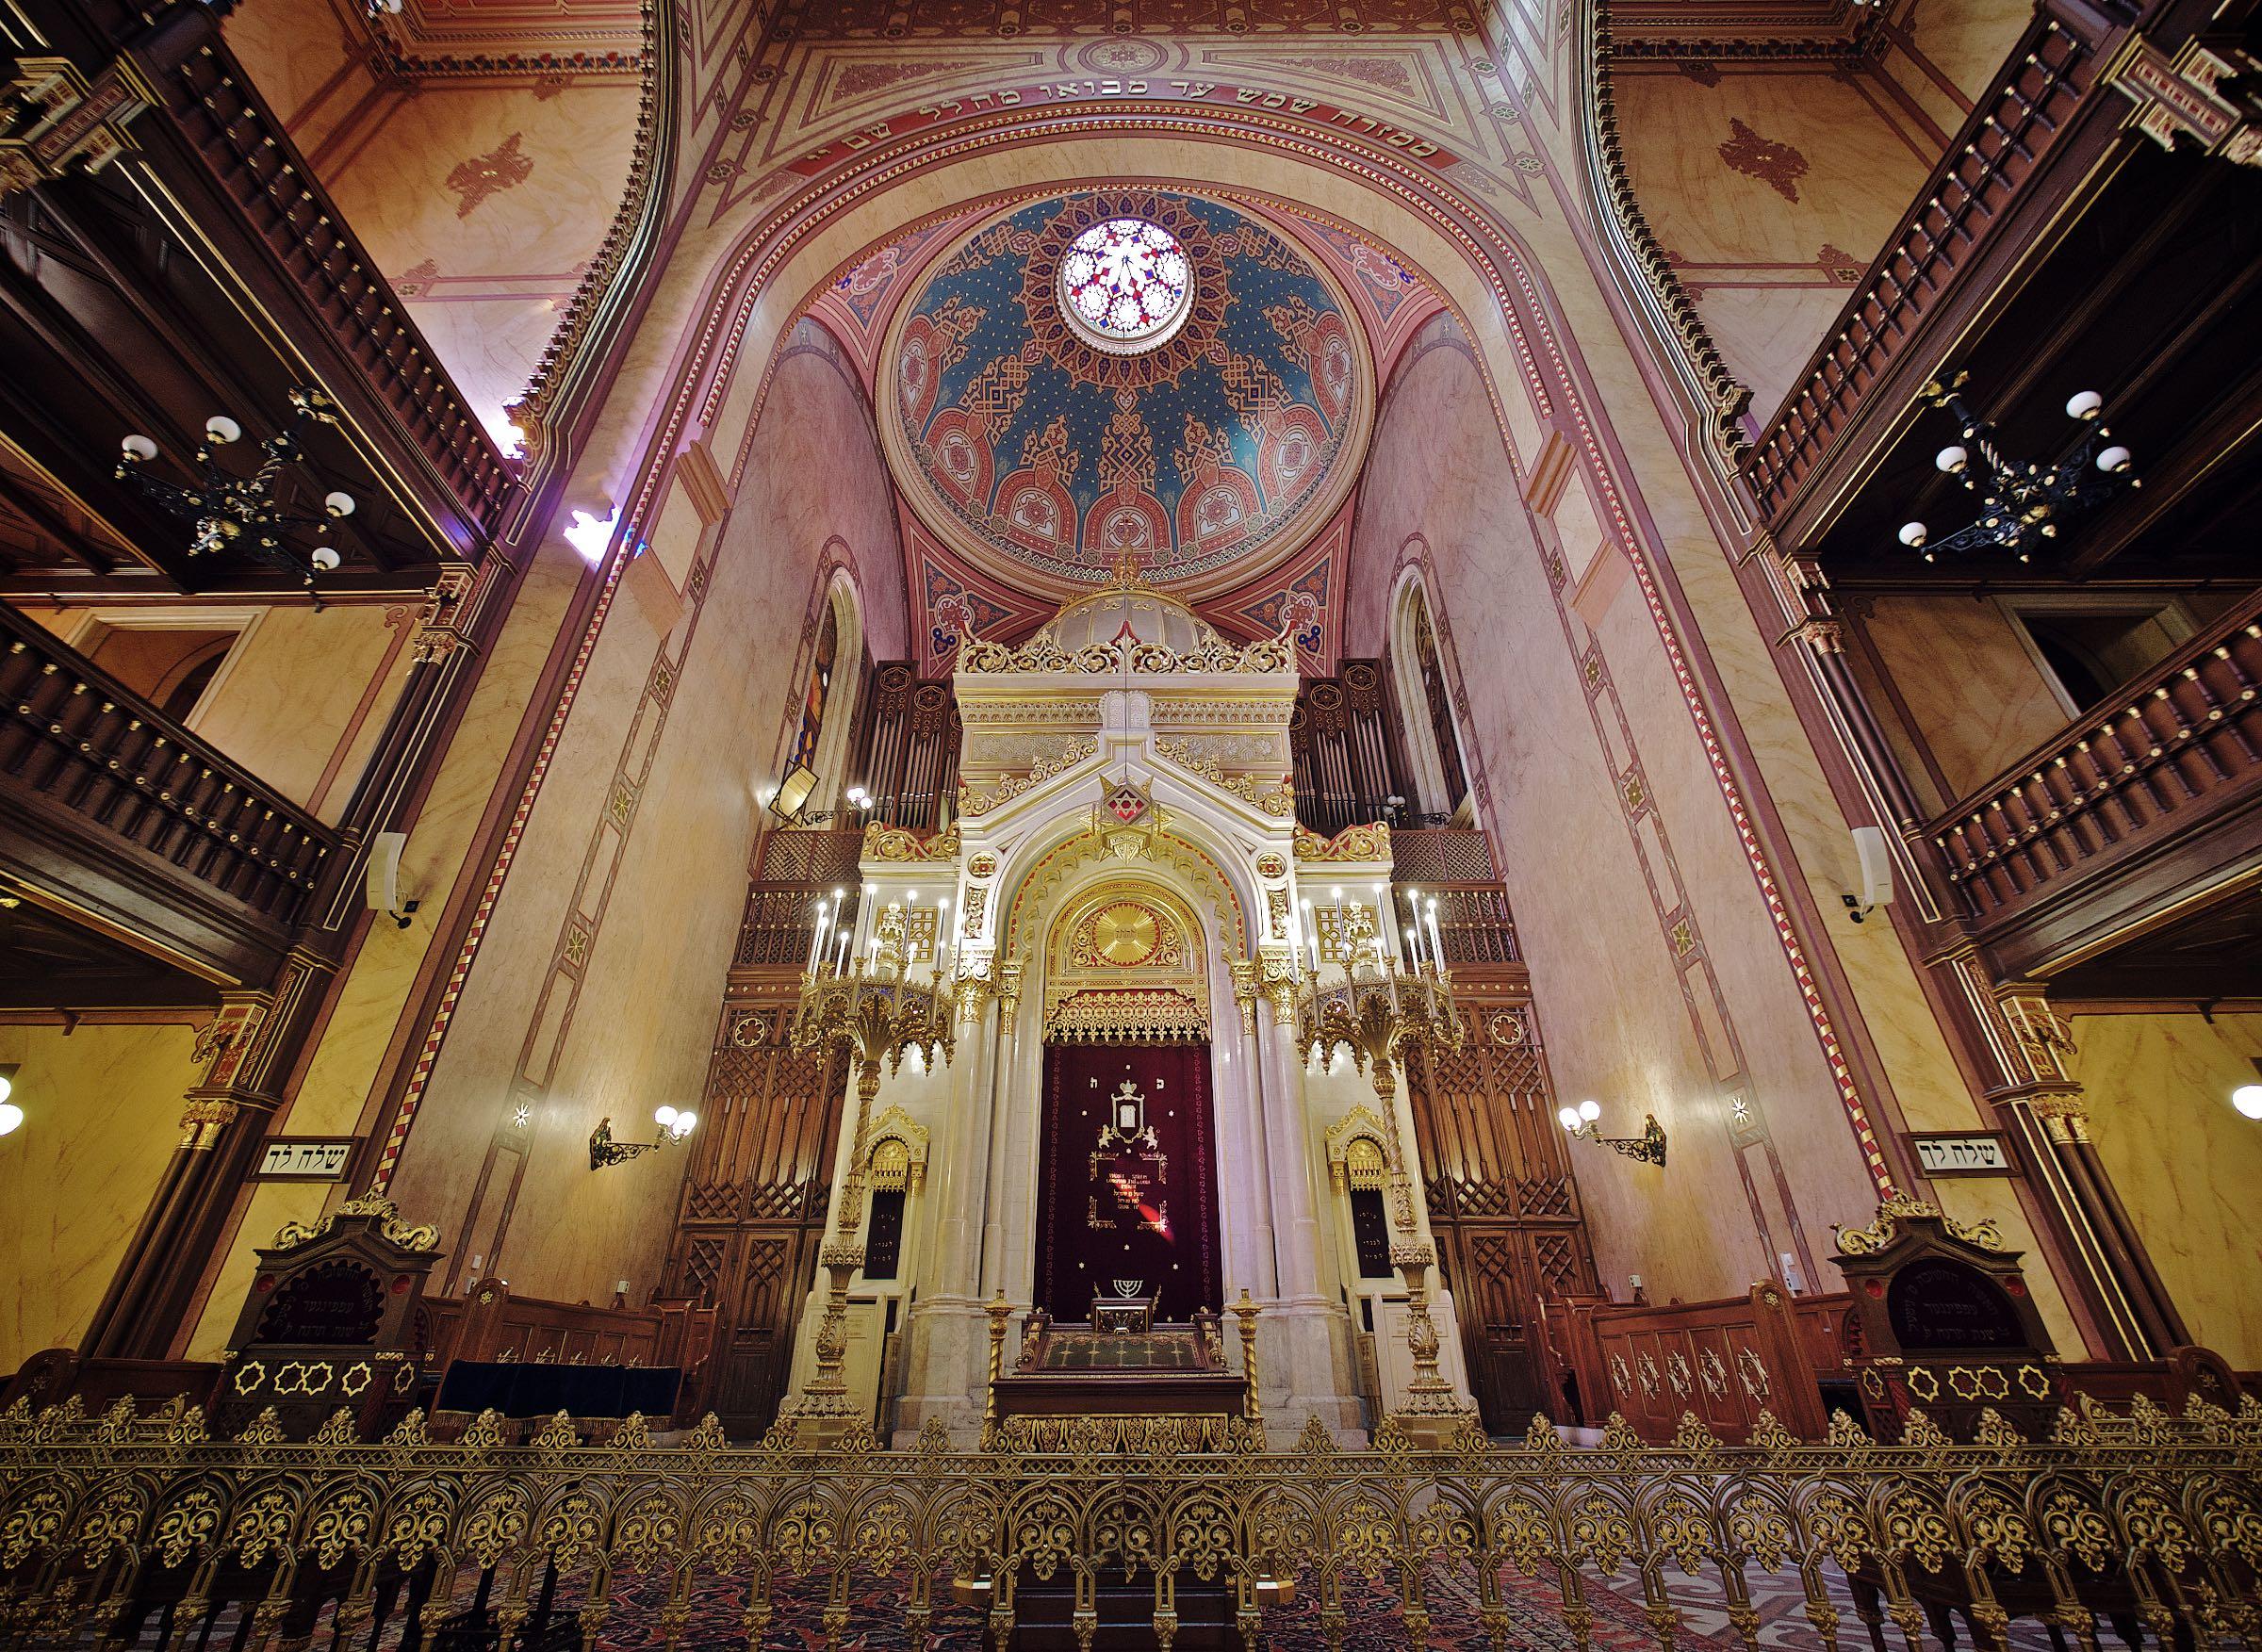 Synagogue Interiors